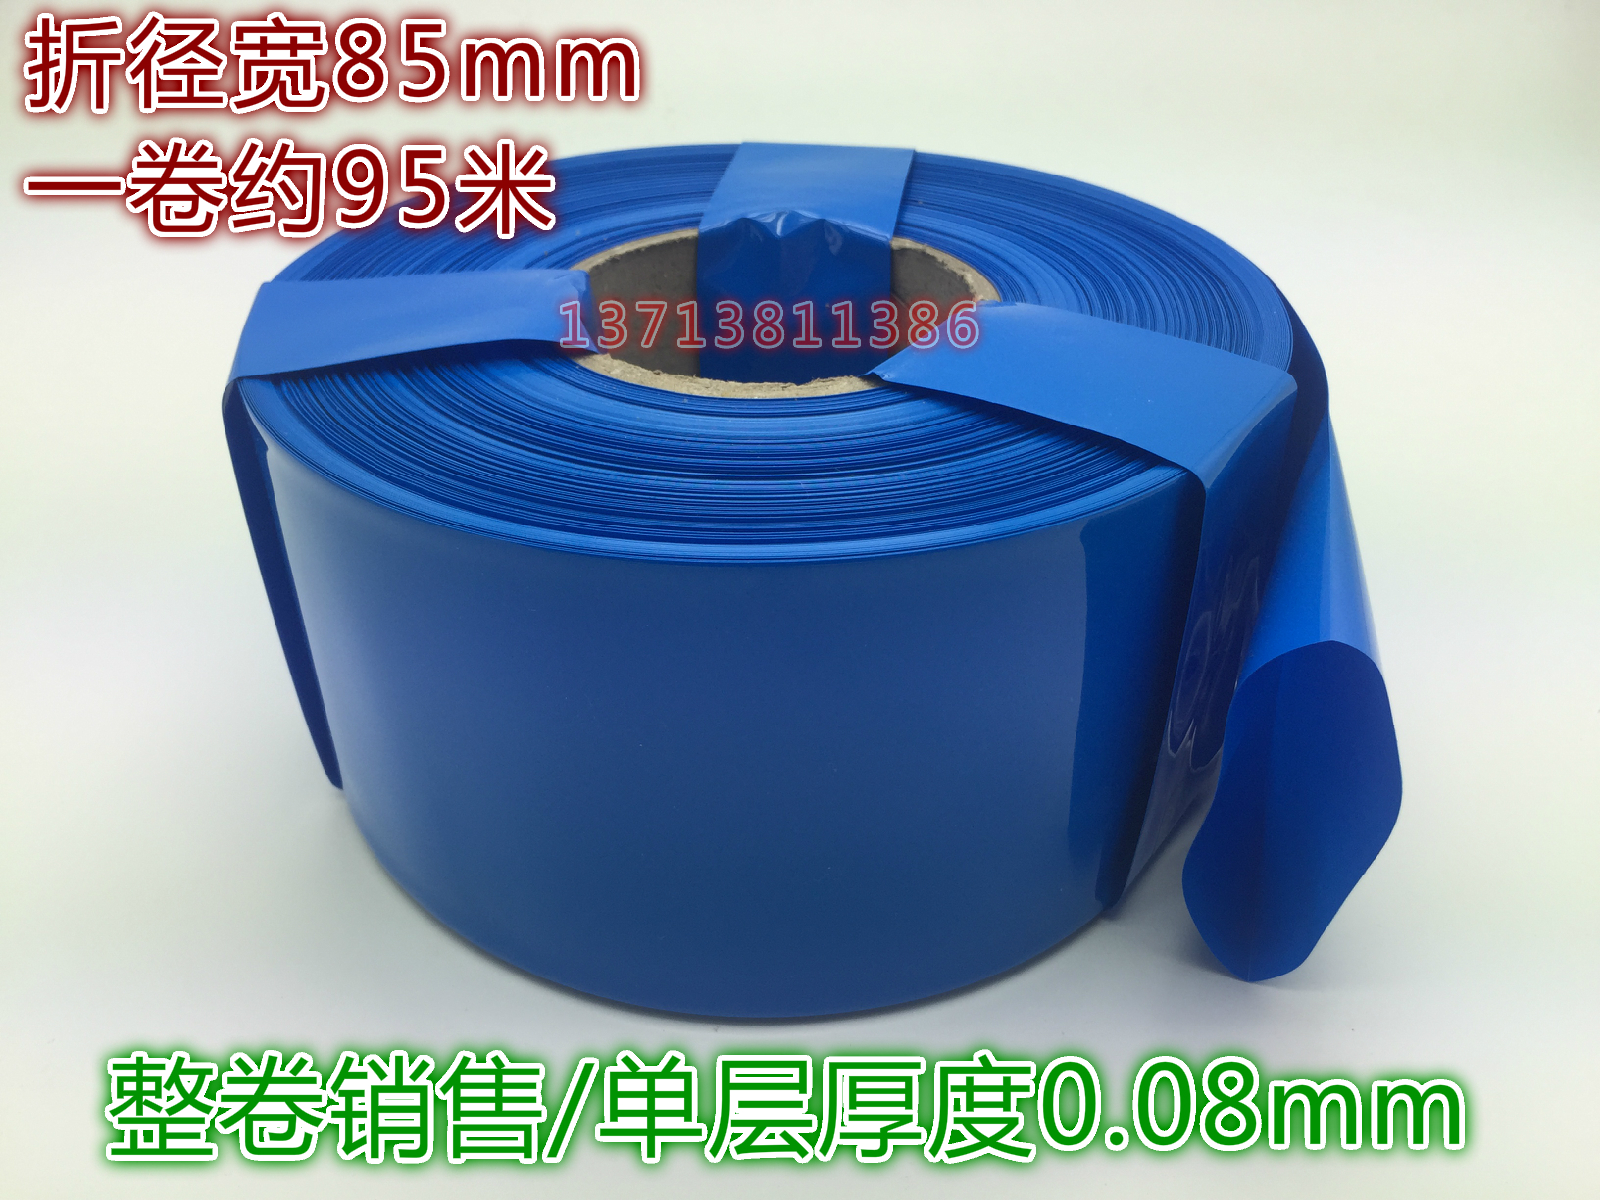 Doblar el tubo de PVC de diámetro de 70 mm de ancho de color azul modelo de membrana accesorios el paquete de baterías de litio de manga de aislamiento